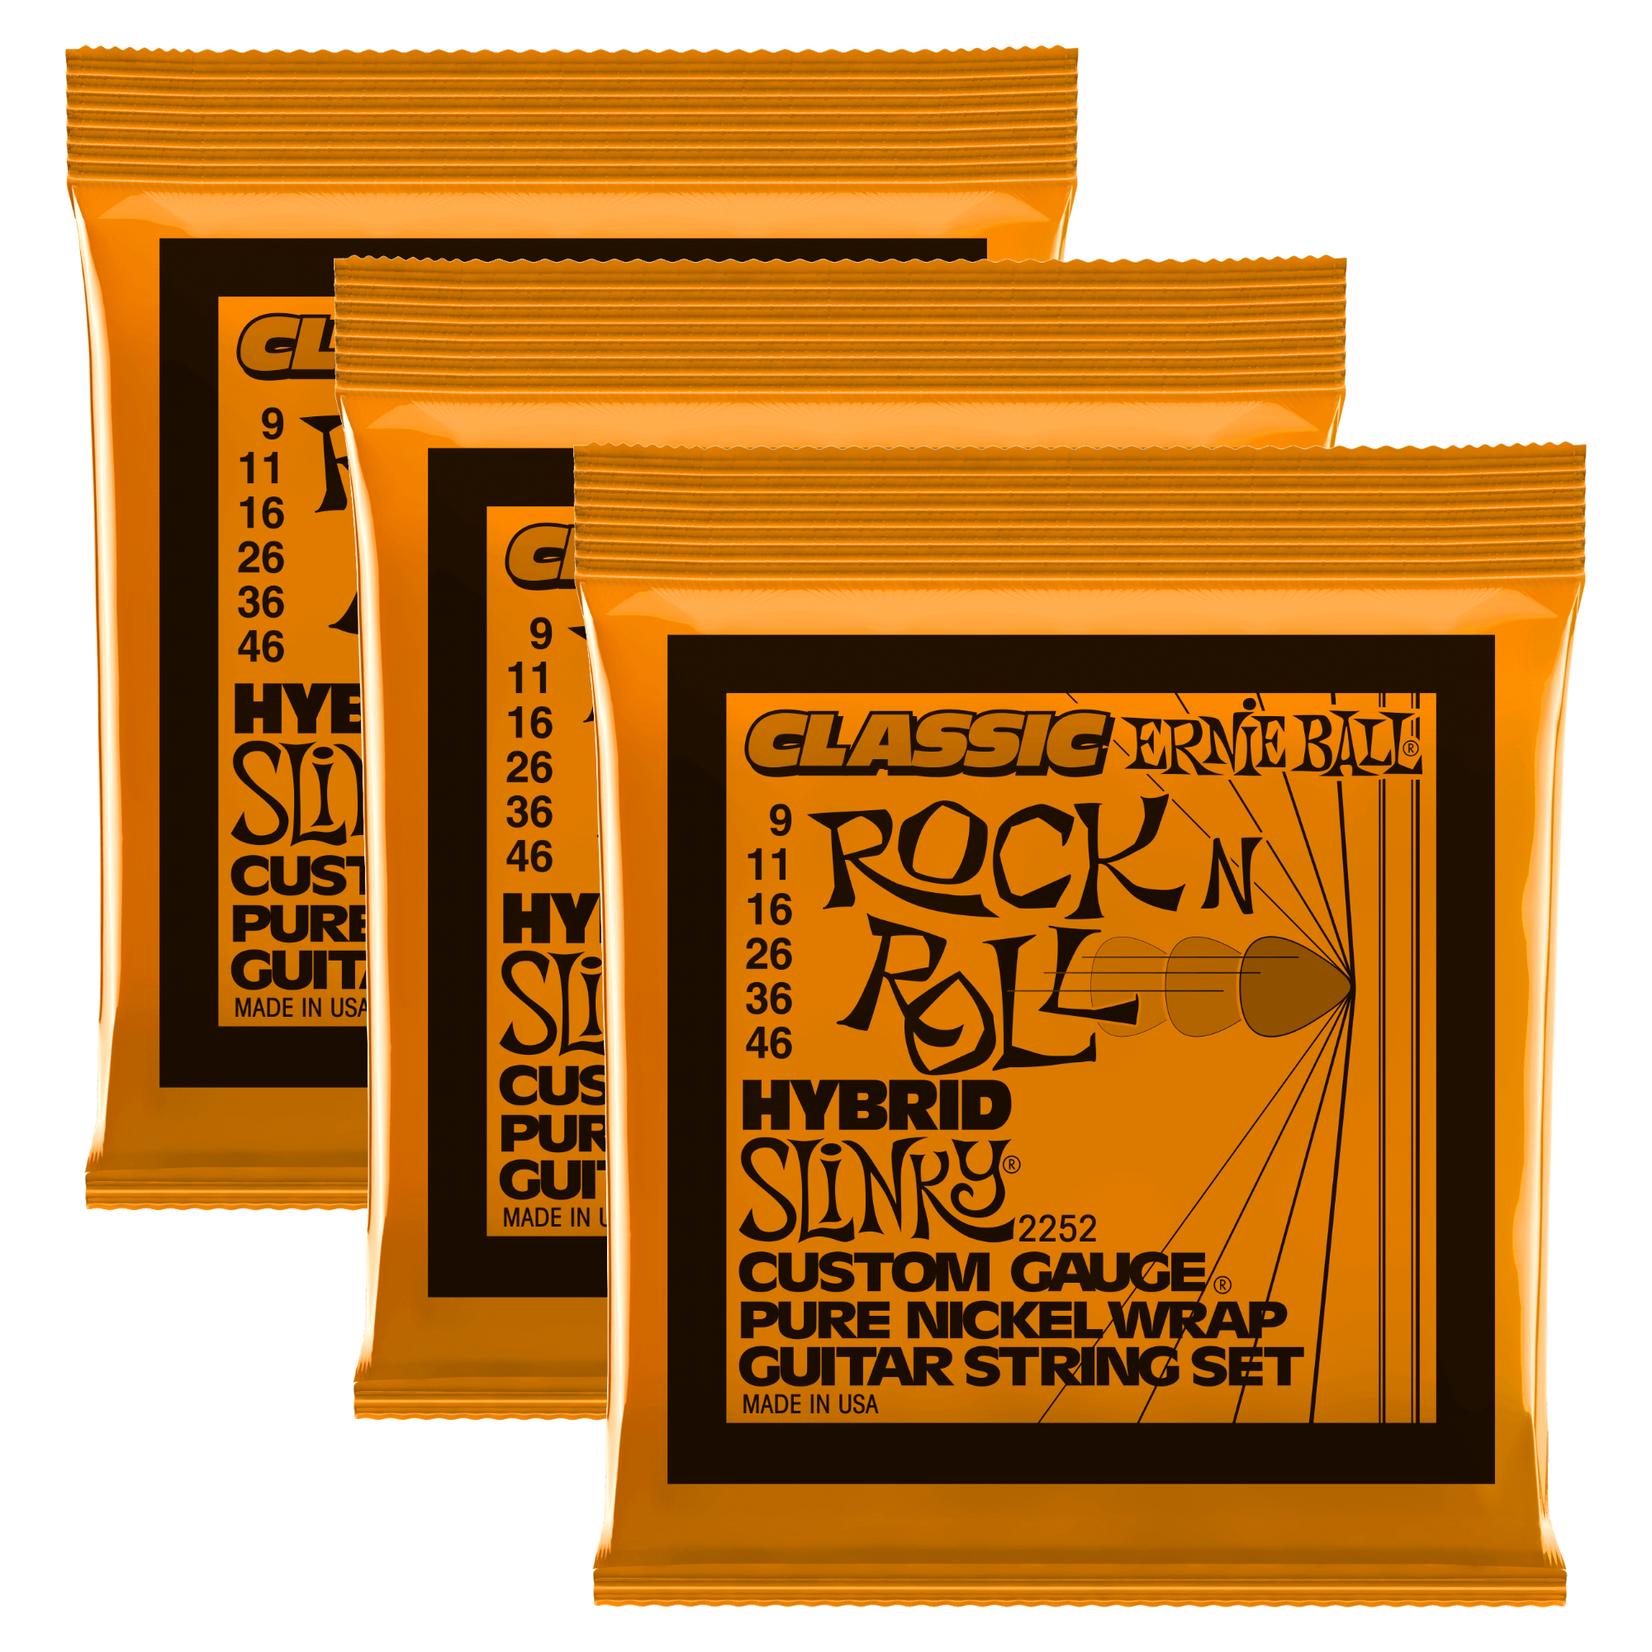 Ernie Ball 3x (3 sets) Ernie Ball Classic Rock Pure Nickel Wrap Hybrid Slinky Electric Guitar Strings, 9-46 (P02252)